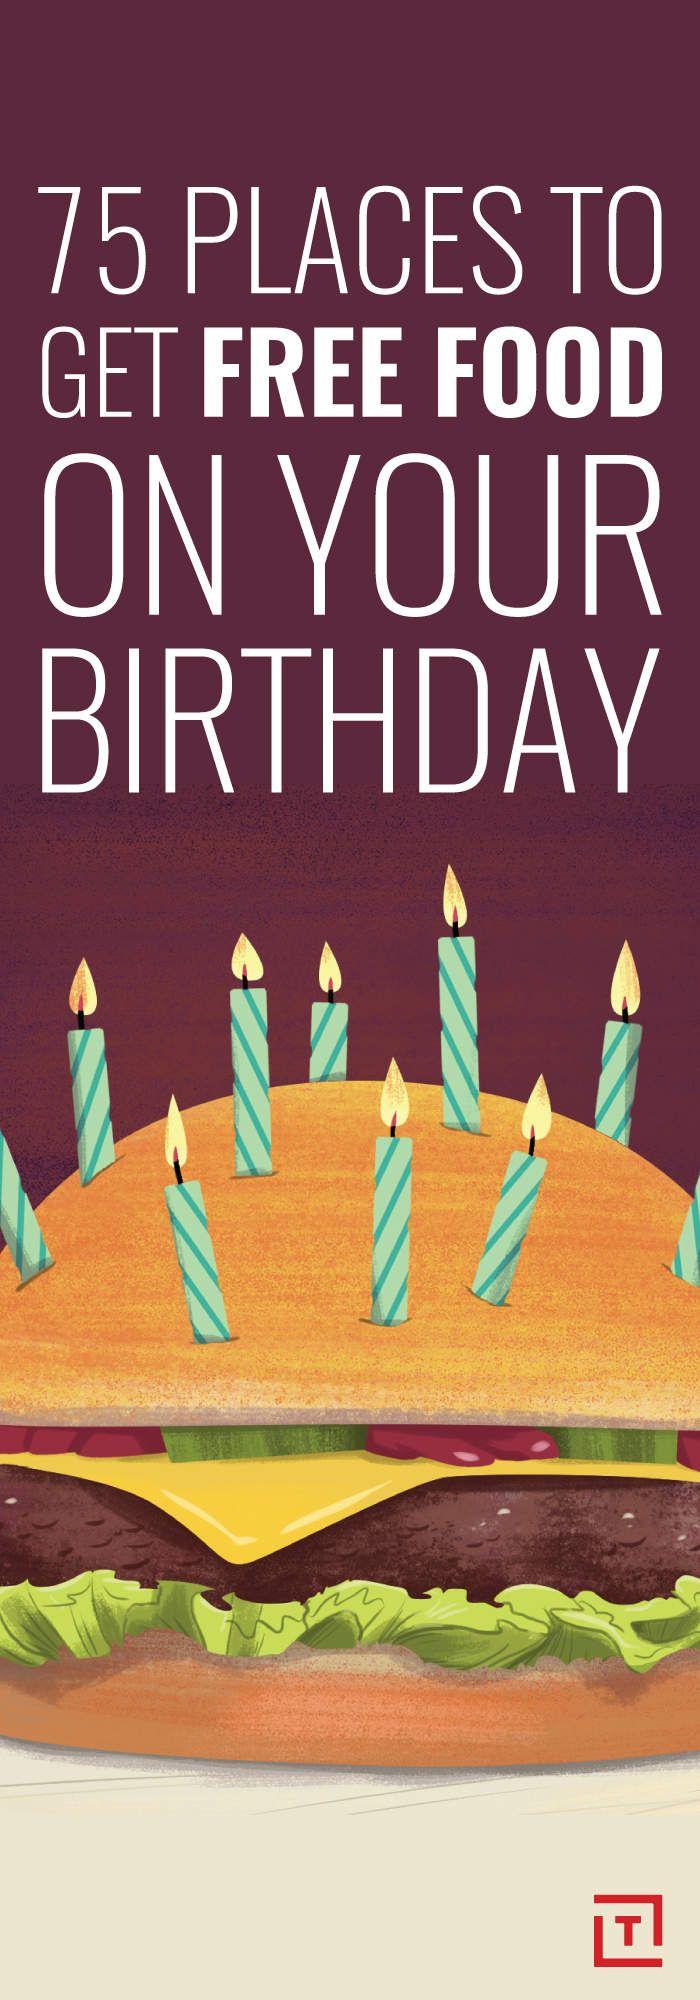 Best 25 Free birthday food ideas on Pinterest Free birthday